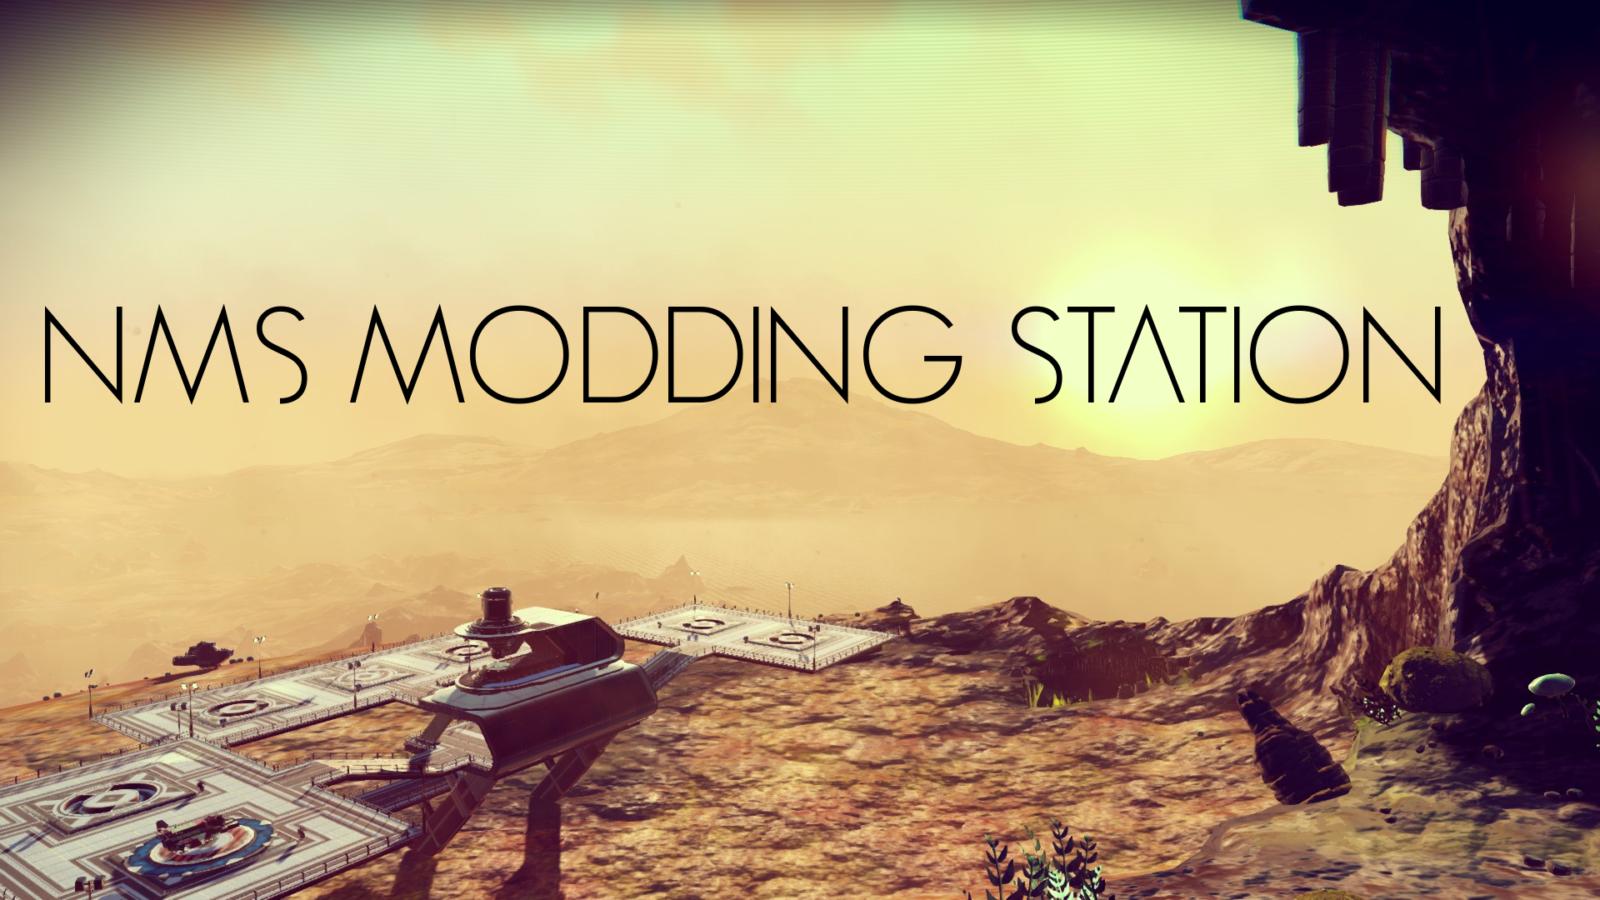 NMS MODDING STATION